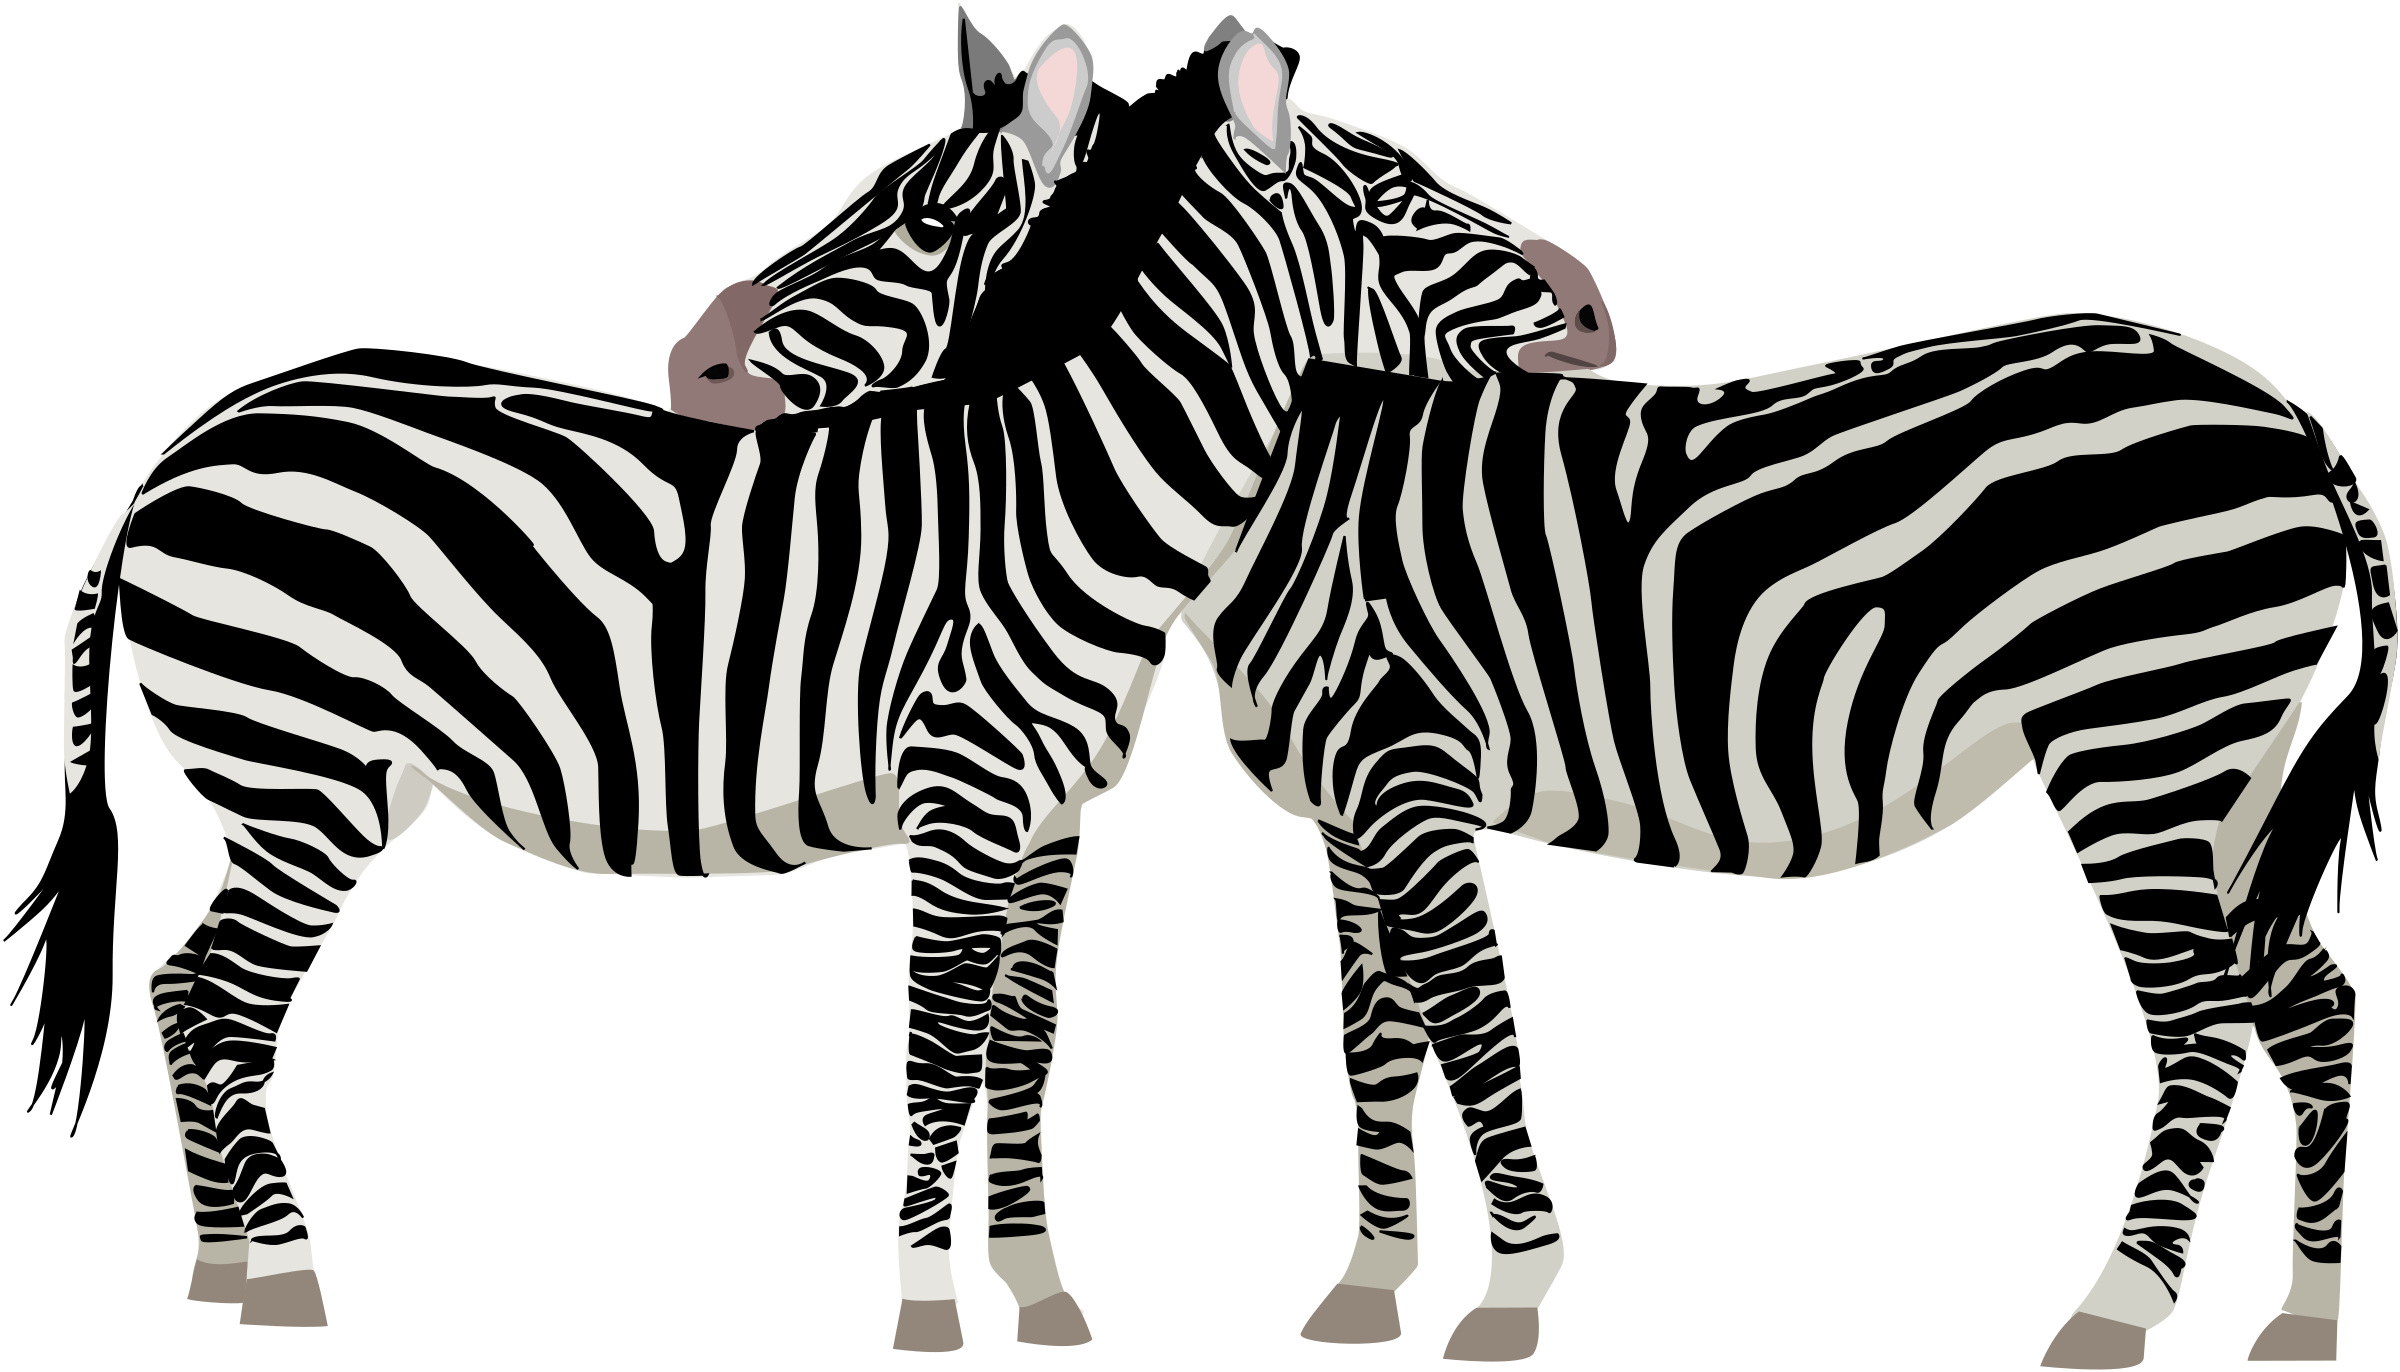 Families clipart zebra. Zebras big image png